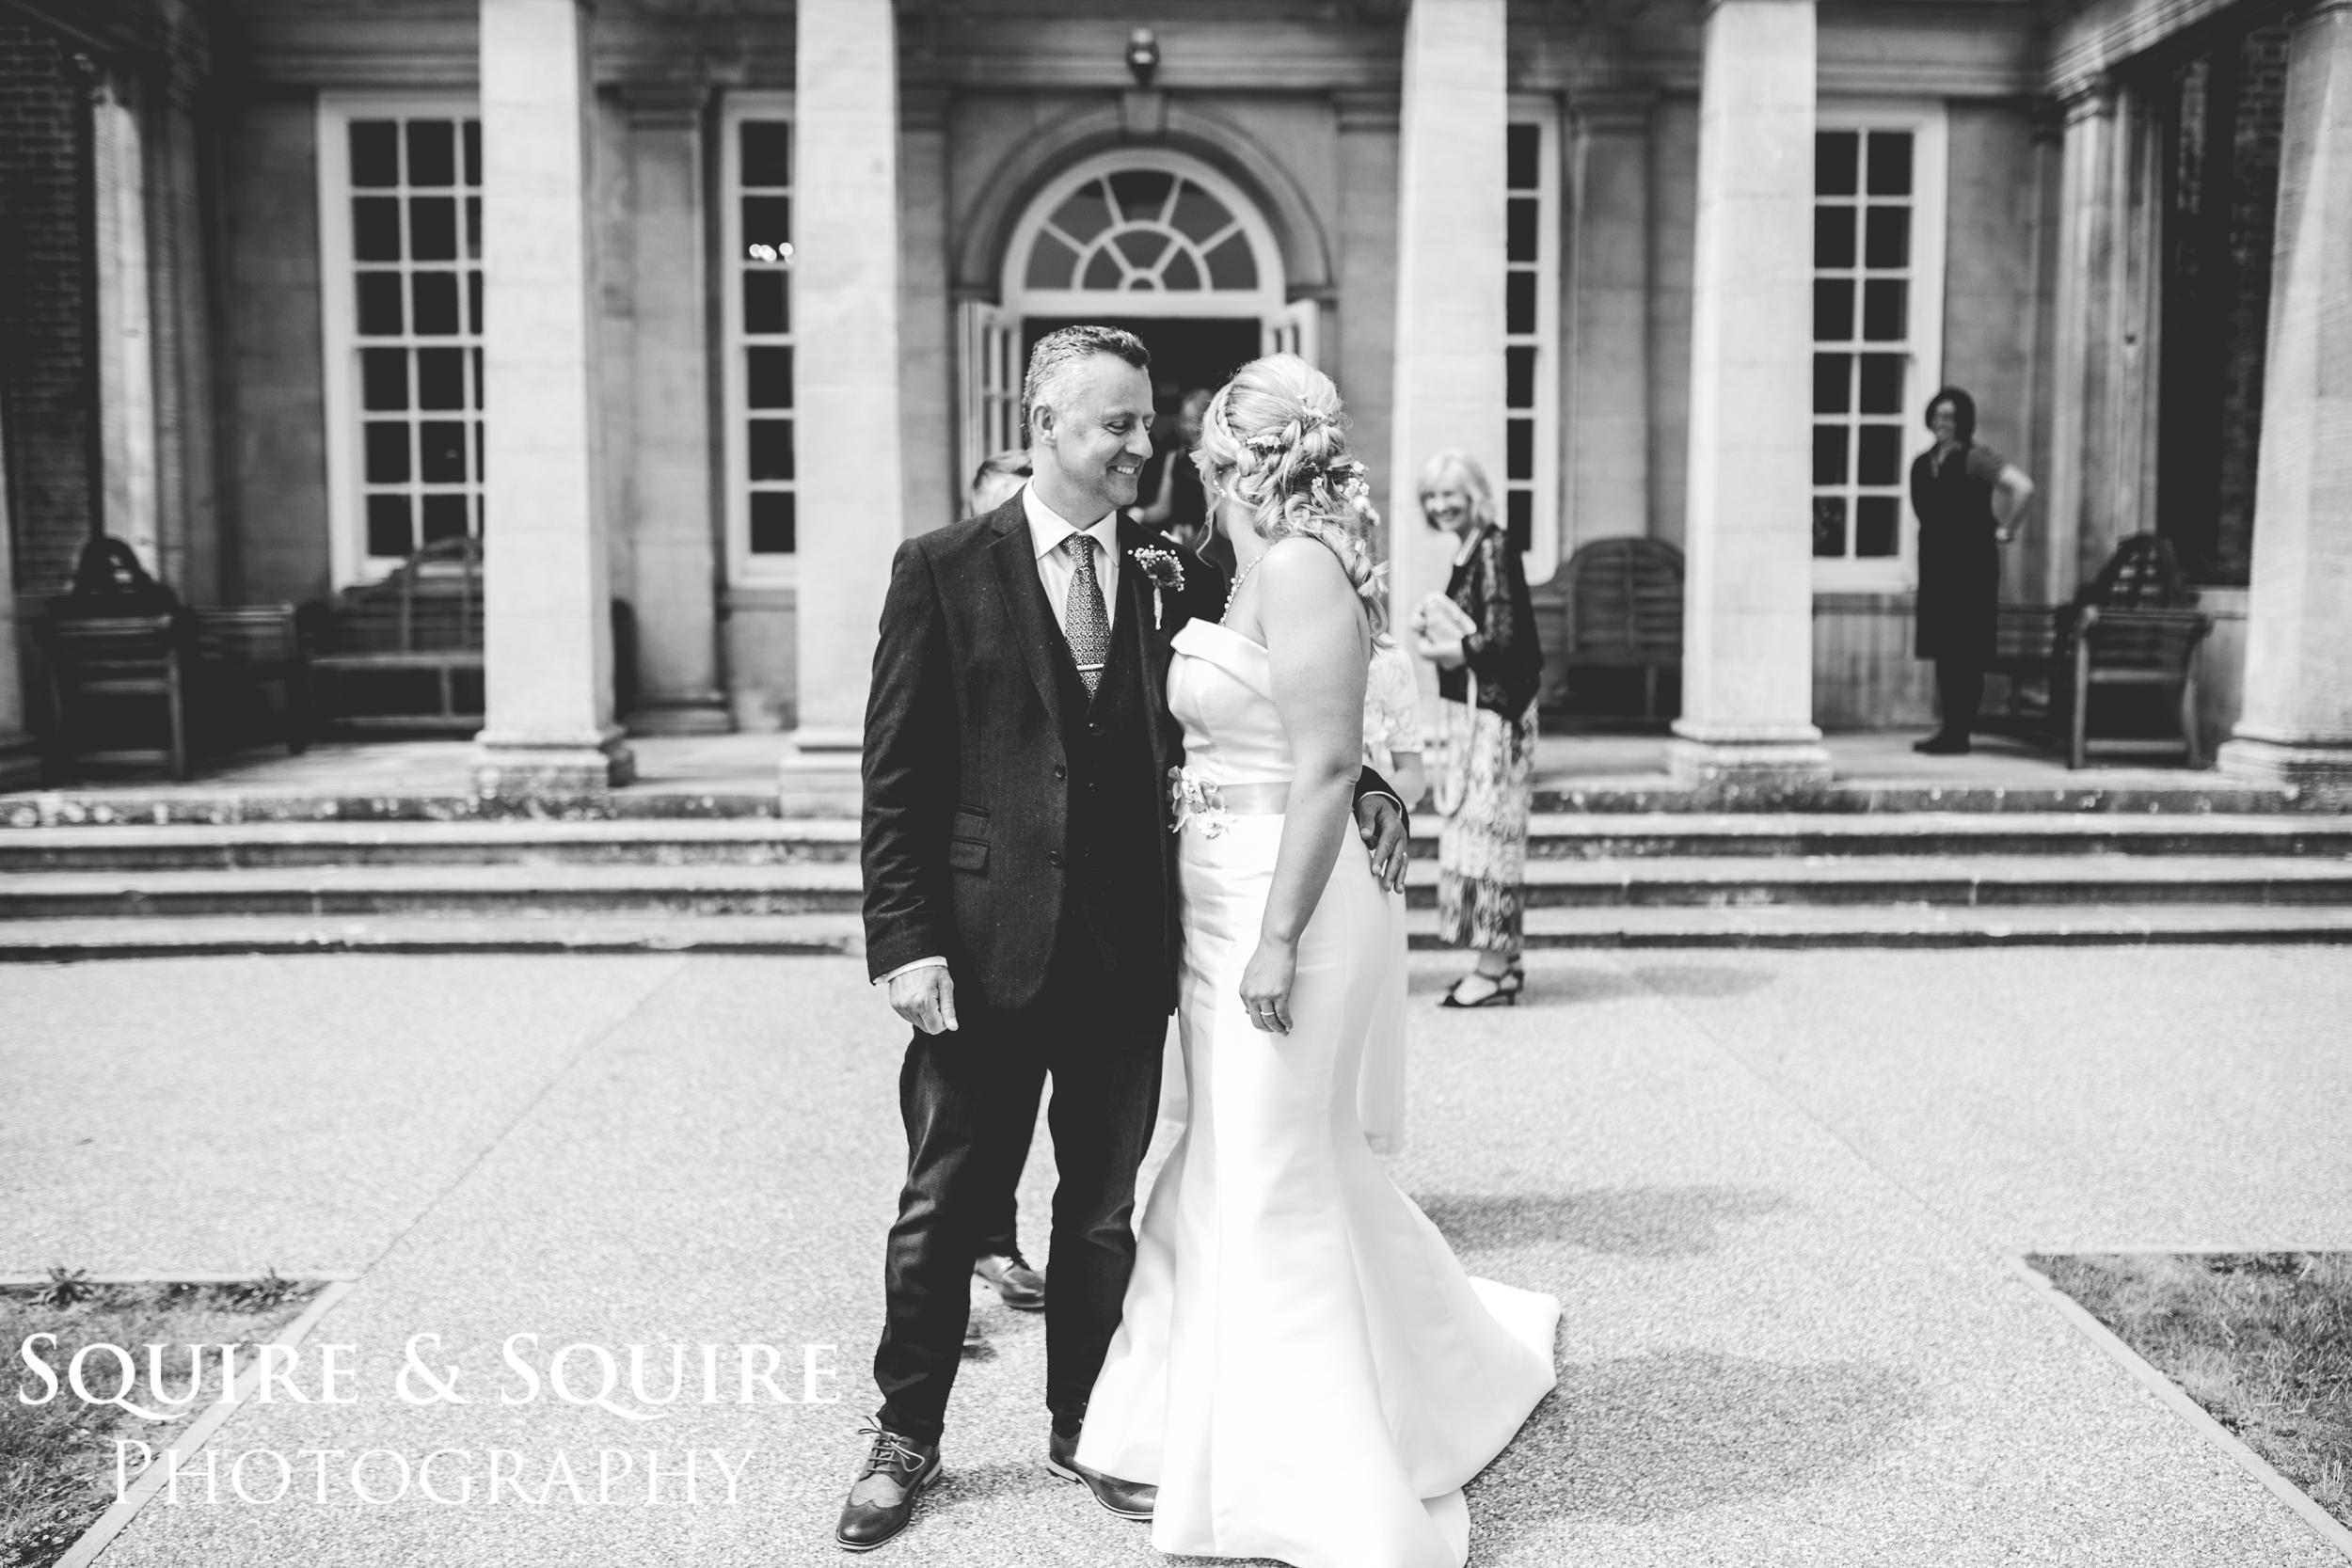 wedding_photography_catthorpe Manor (45 of 66).jpg